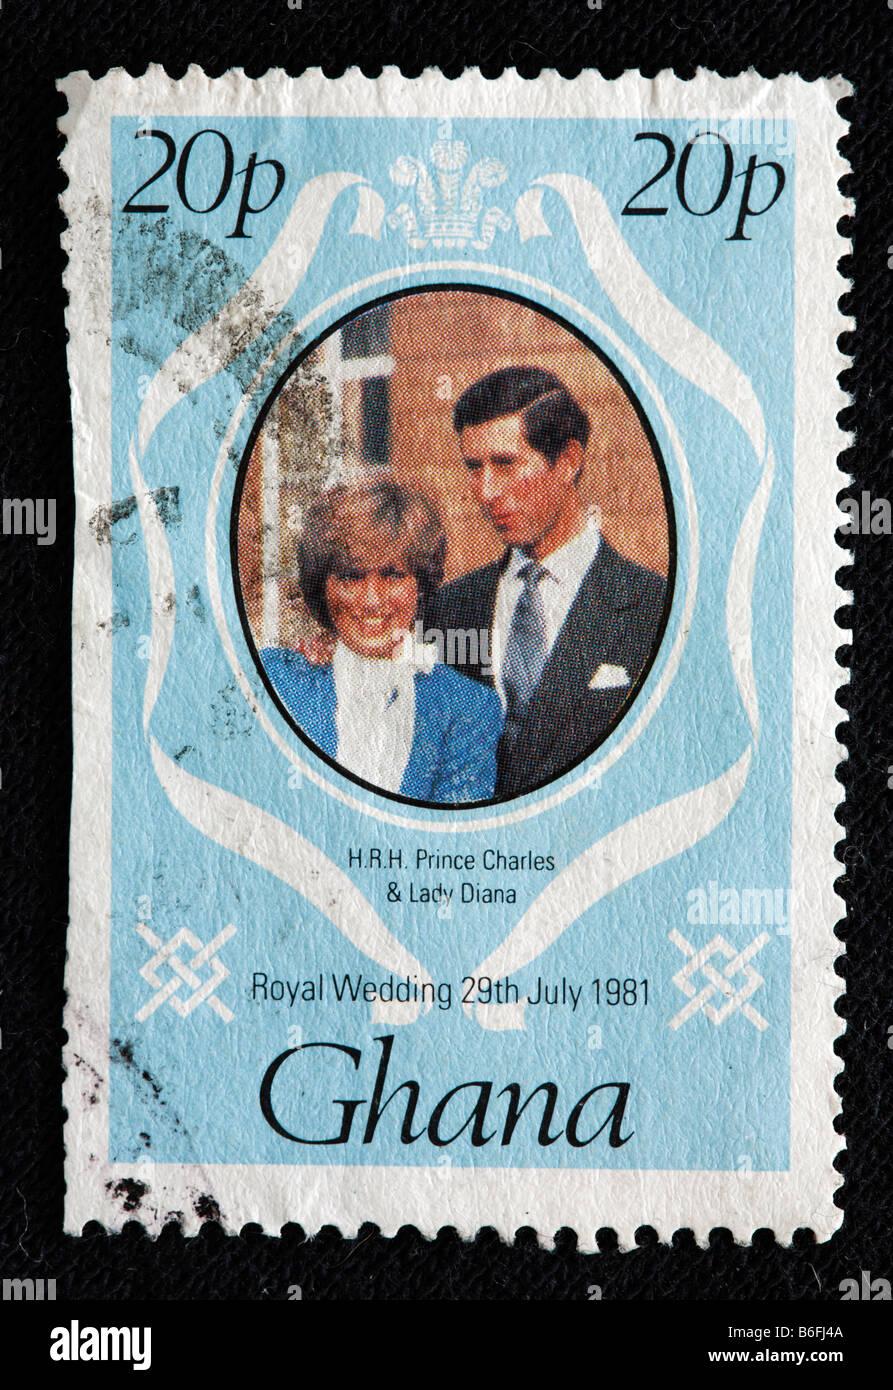 Matrimonio del principe Charles e Lady Diana 29 luglio 1981, francobolli, Ghana, 1981 Foto Stock